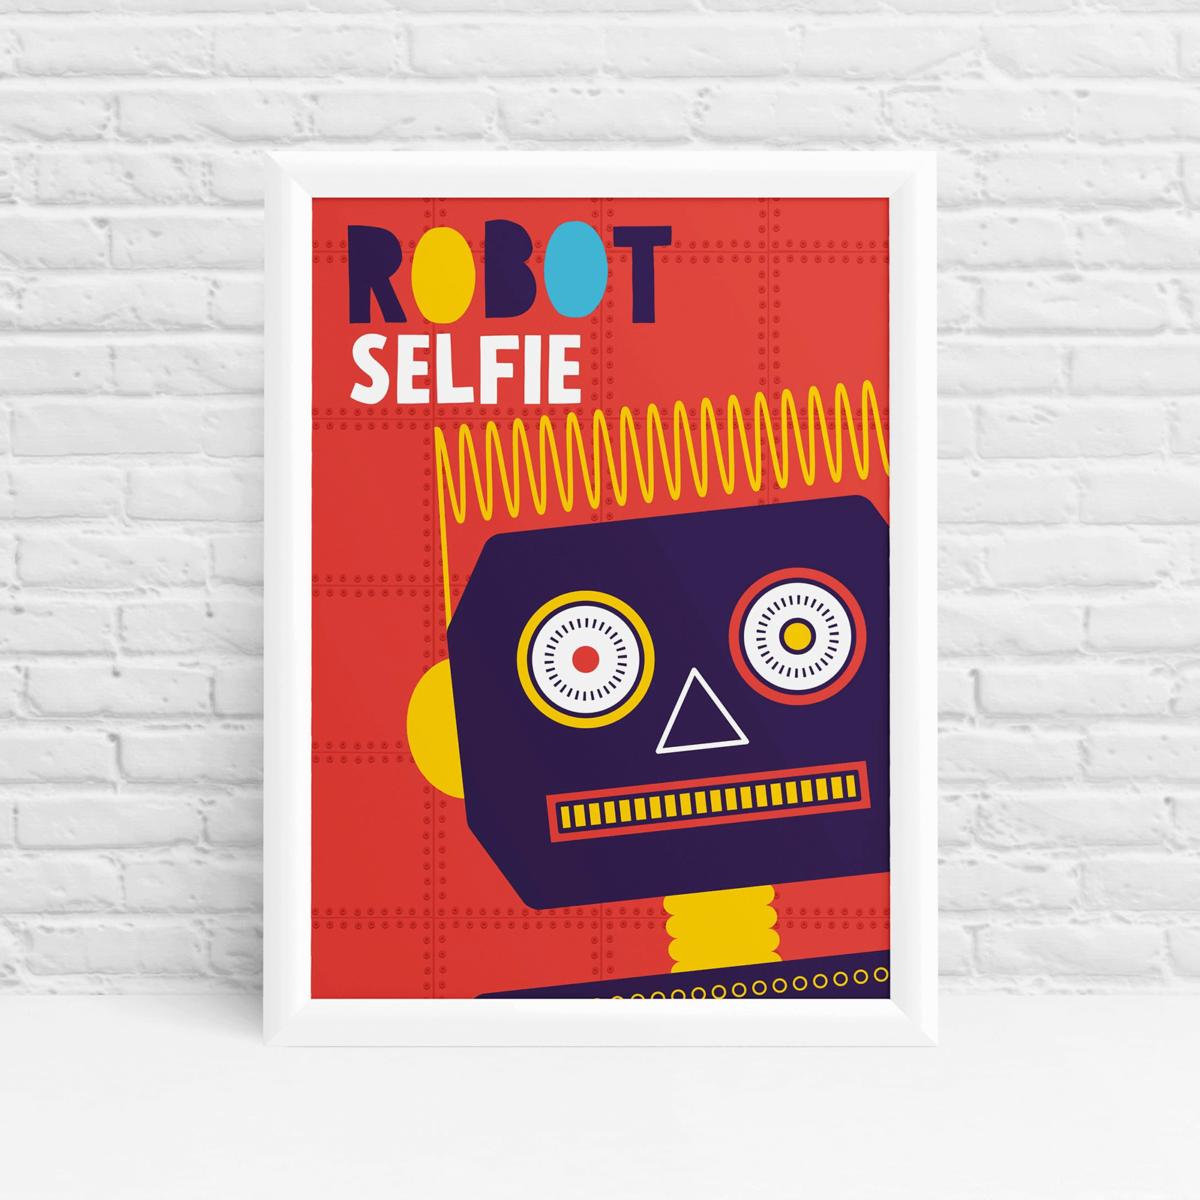 Purple Robot selfie poster original fun wall art by Ibbleobble®